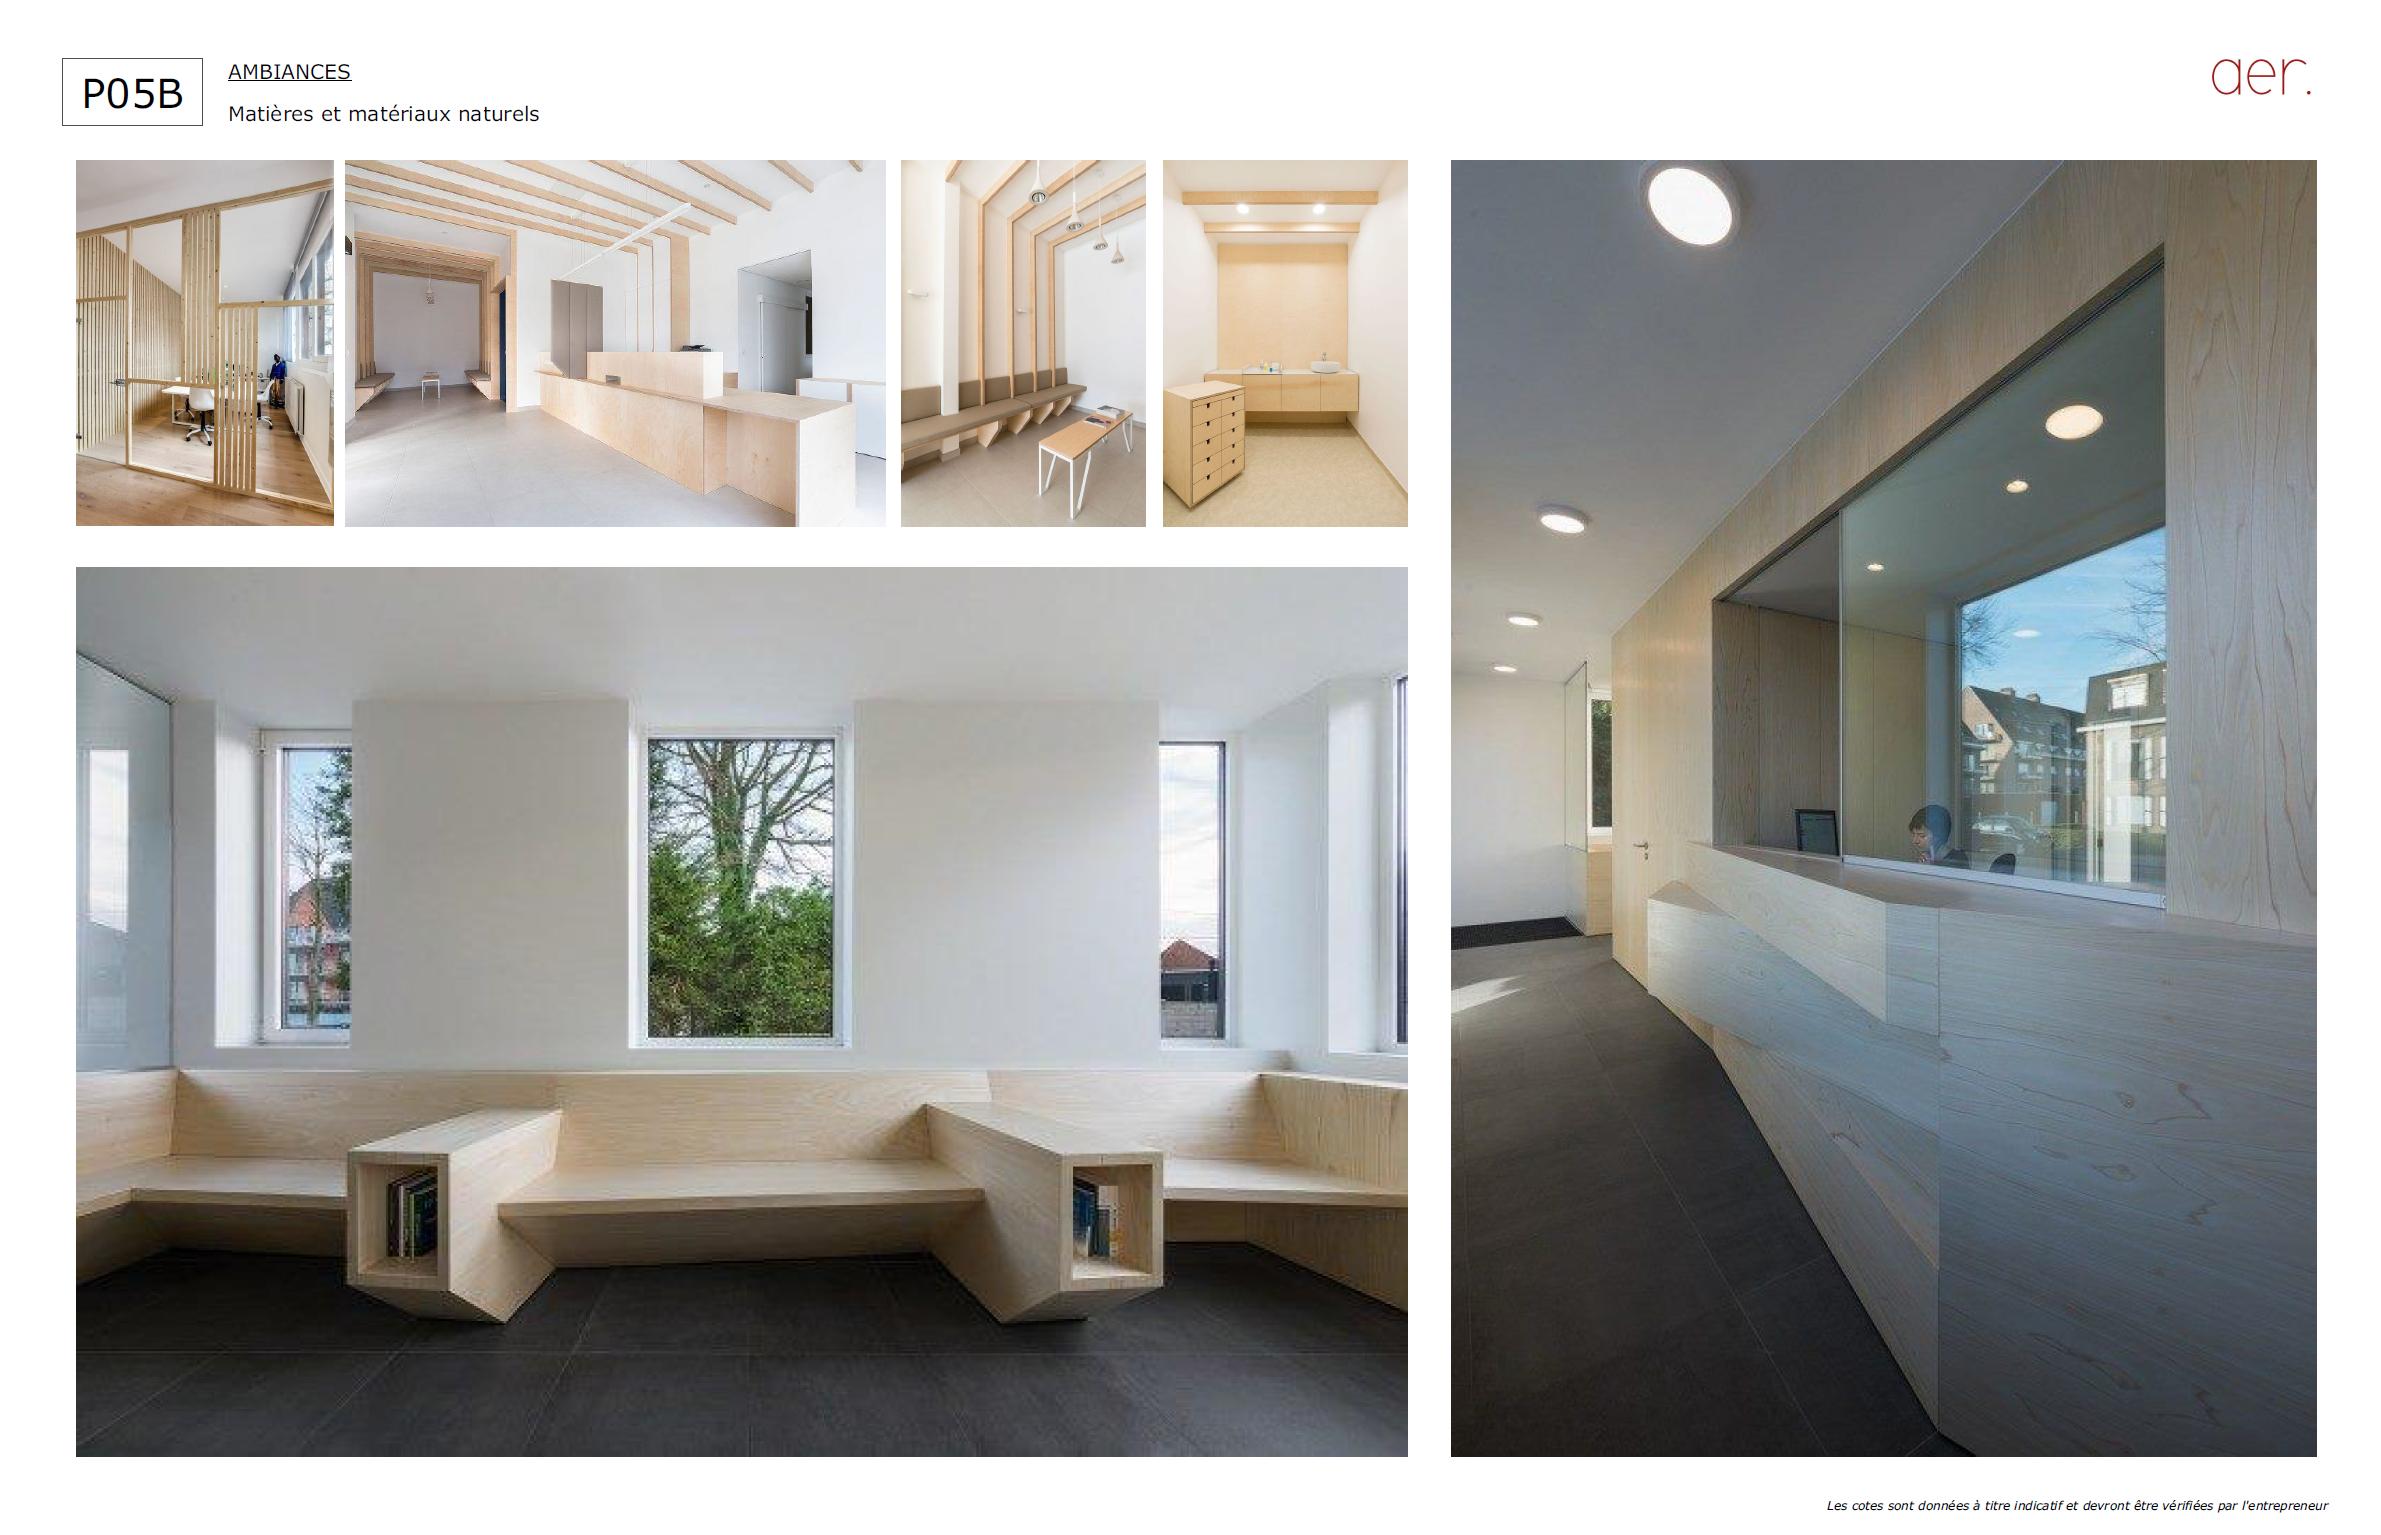 MOOD BOARD : MATERIAUX BRUTS | crédits photo : AER Architecture